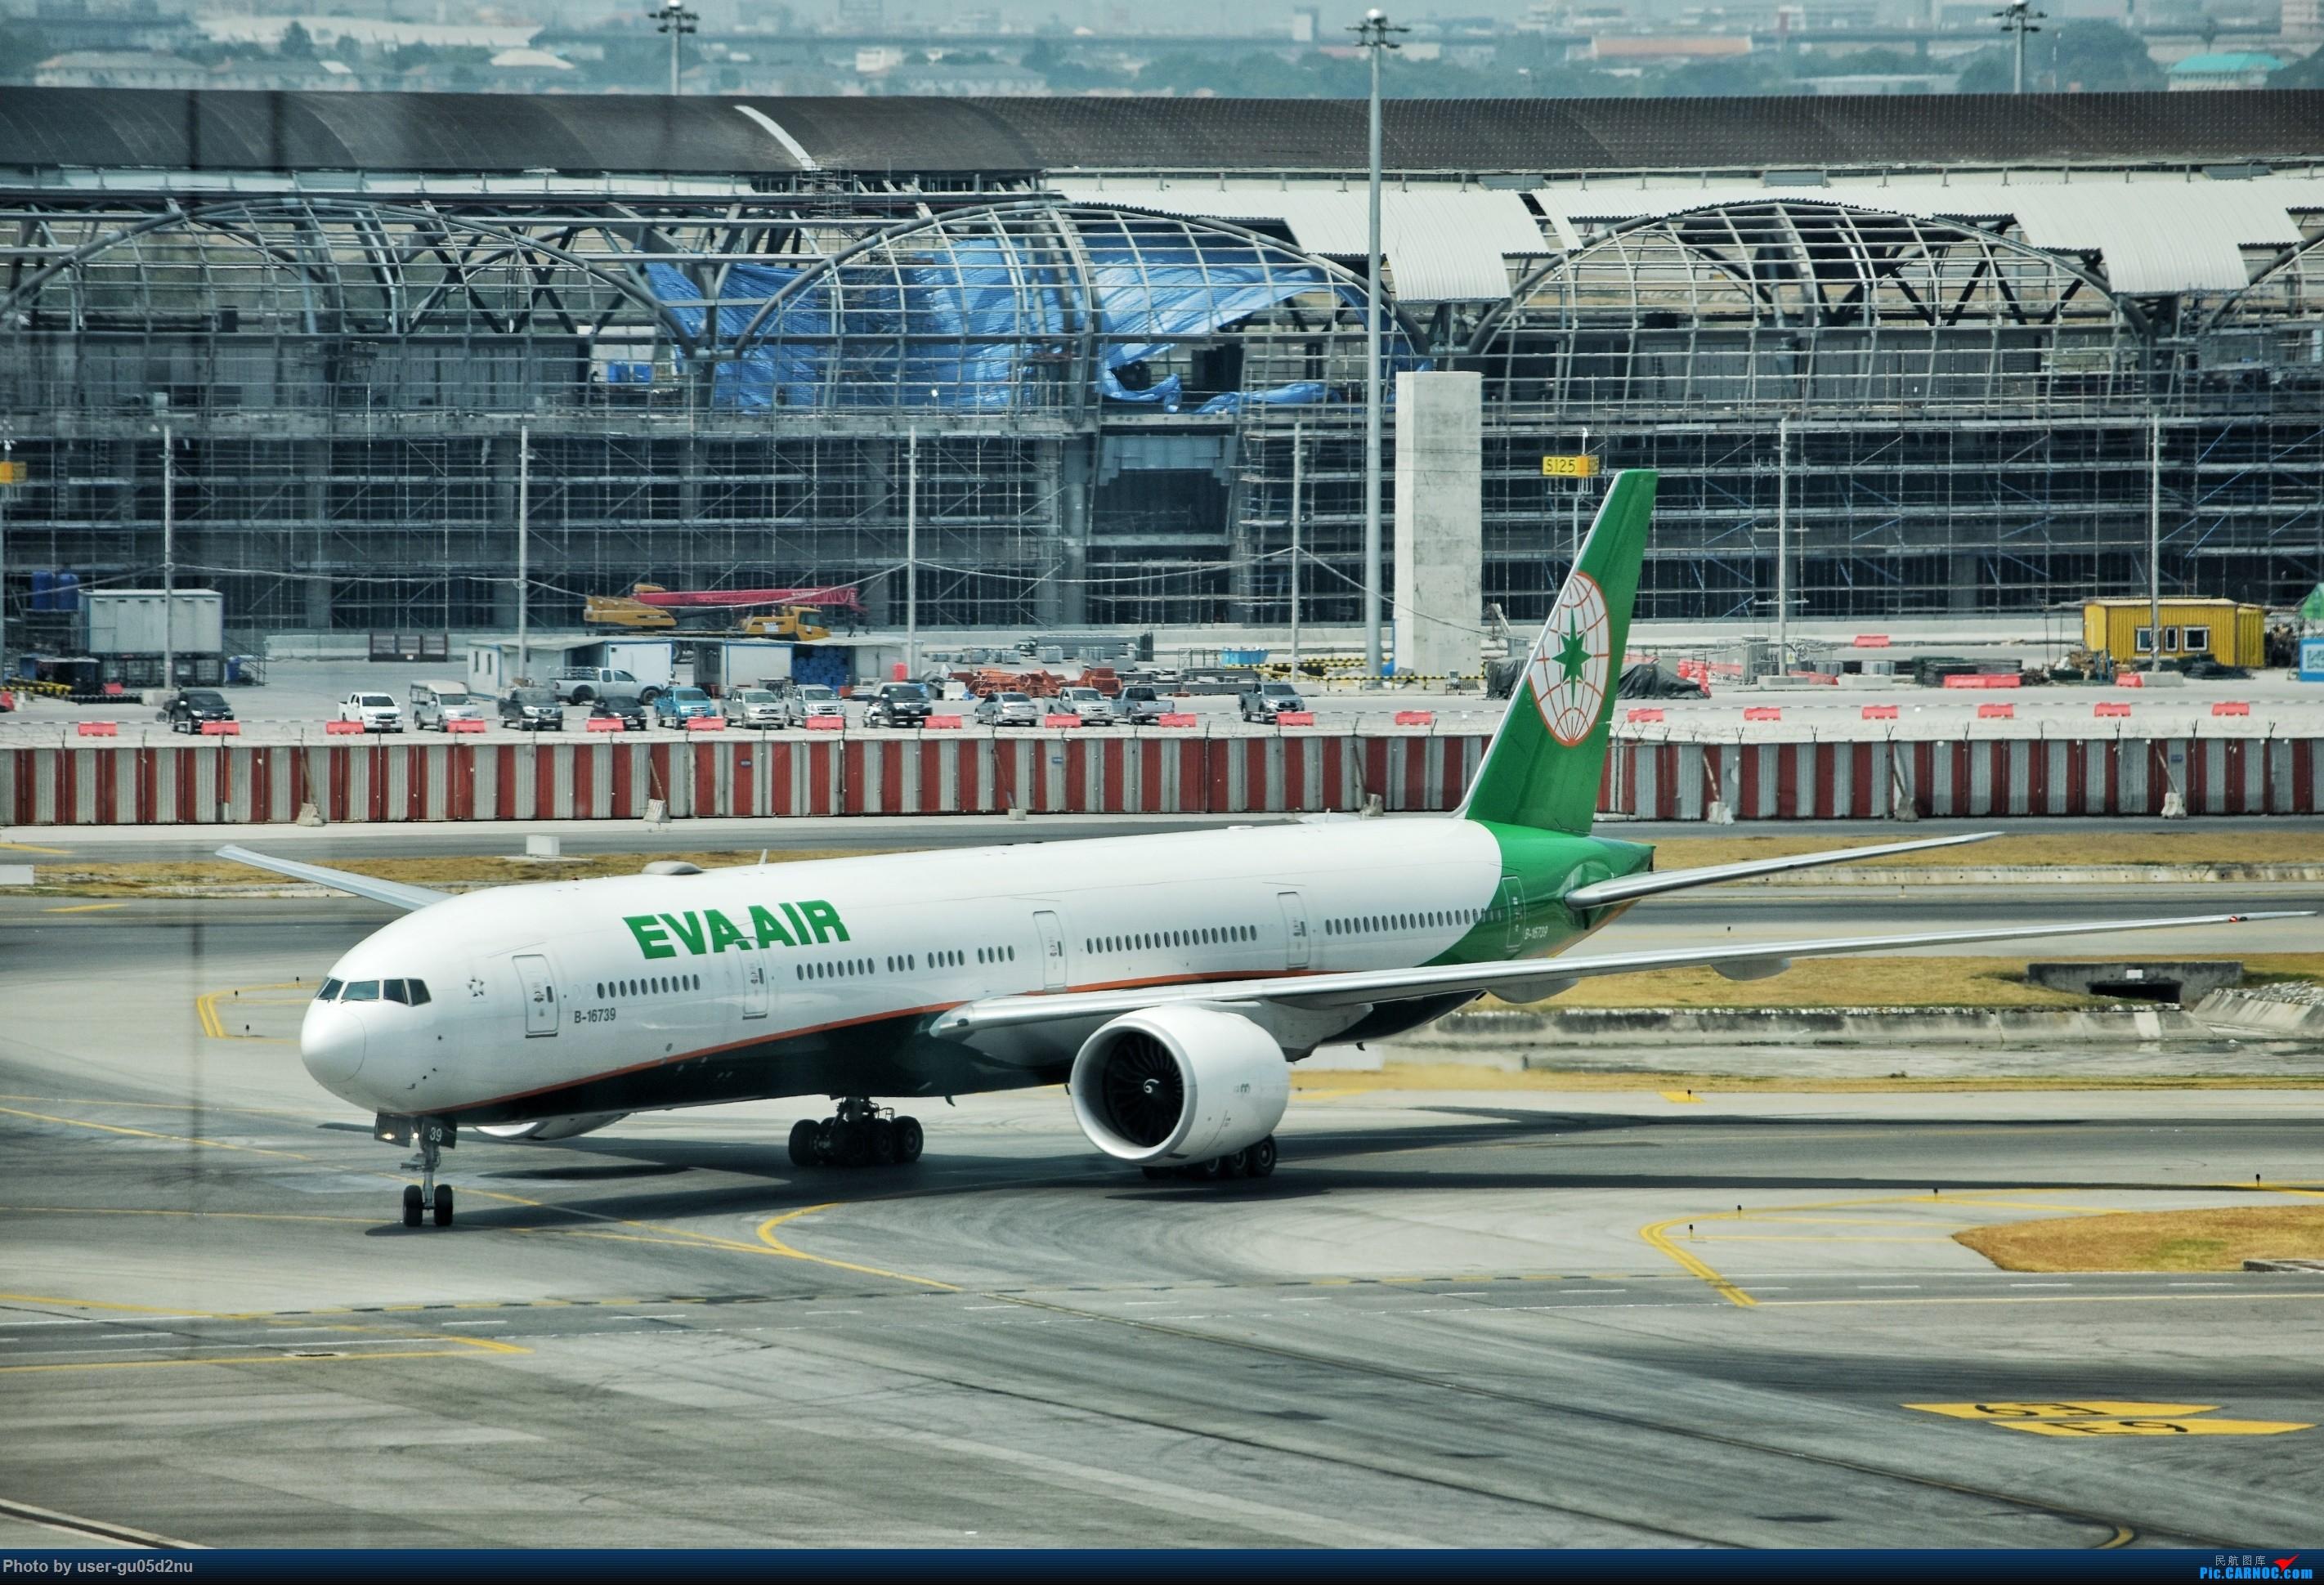 Re:[原创]曼谷素万那普观景平台视角【滑行篇】 BOEING 777-300ER B-16739 Suvarnabhumi Airport